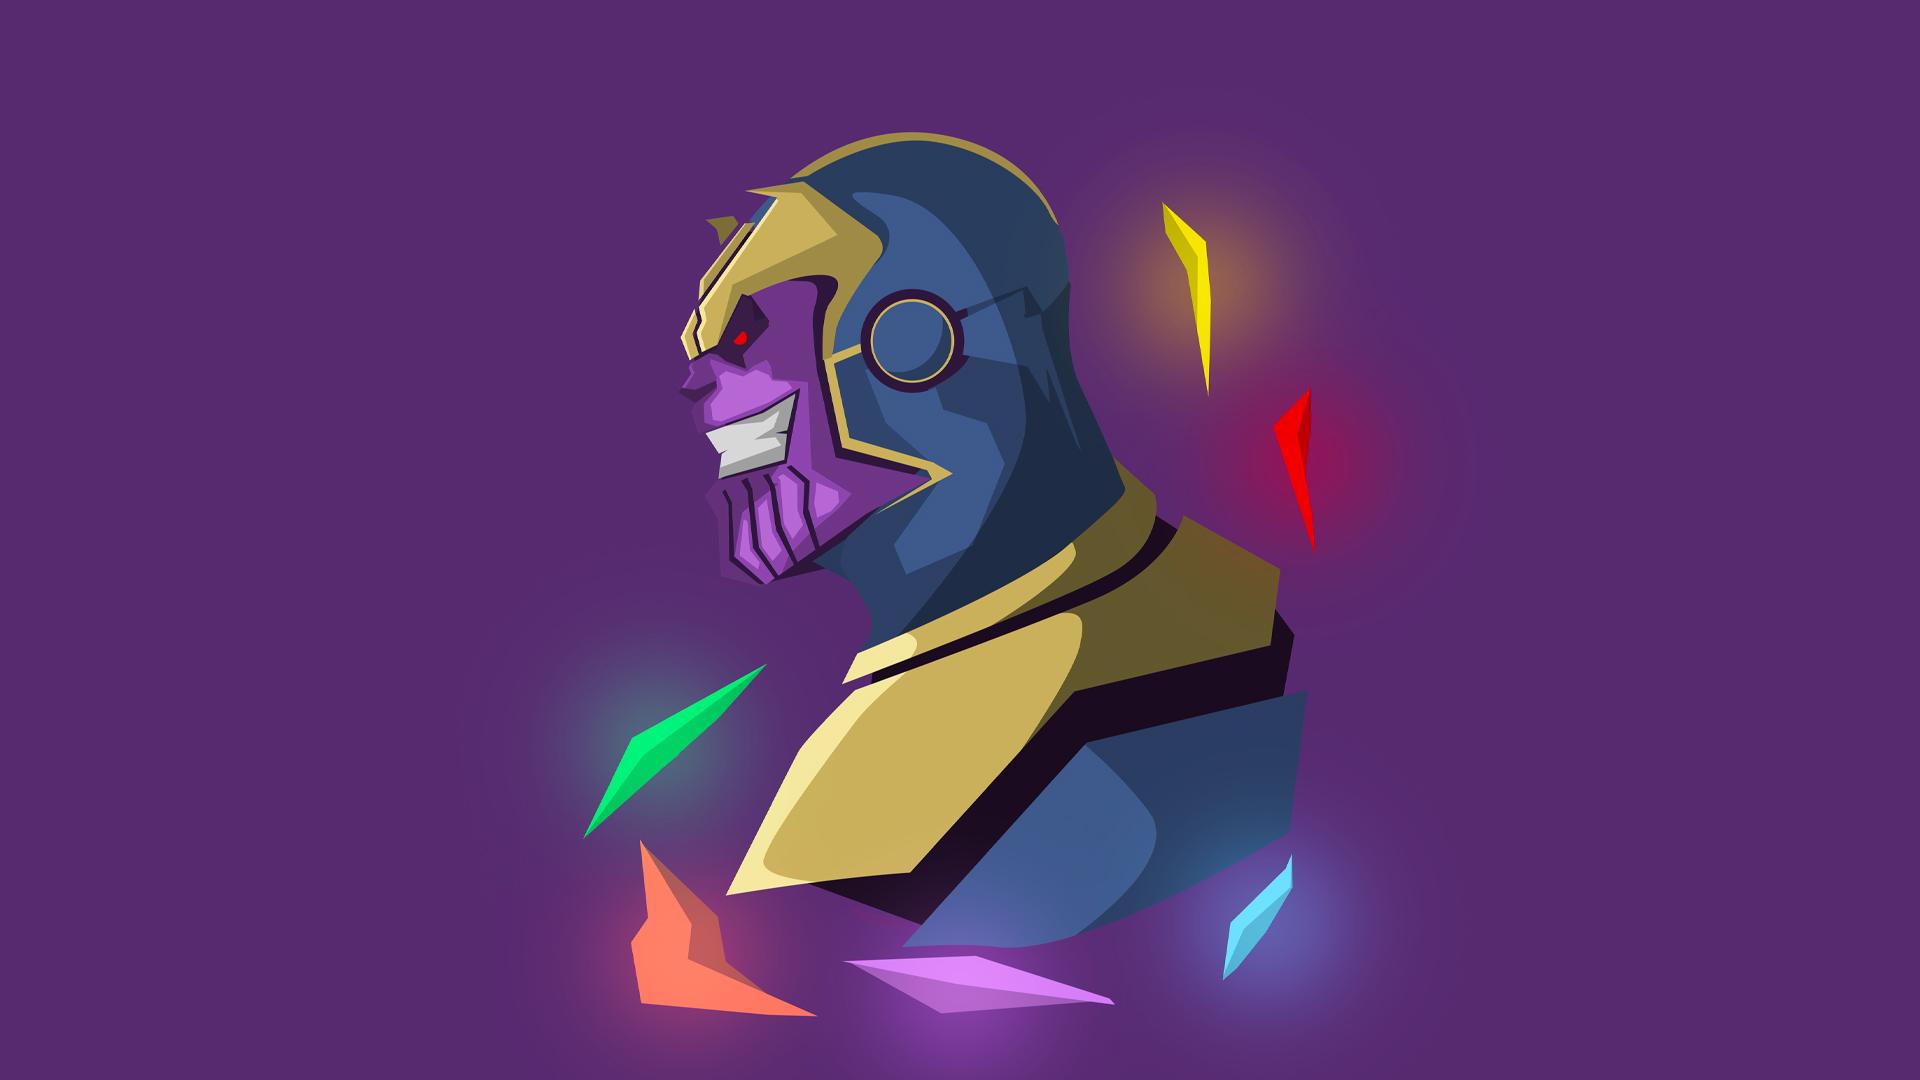 Wallpaper Thanos Marvel Cinematic Universe Marvel Comics